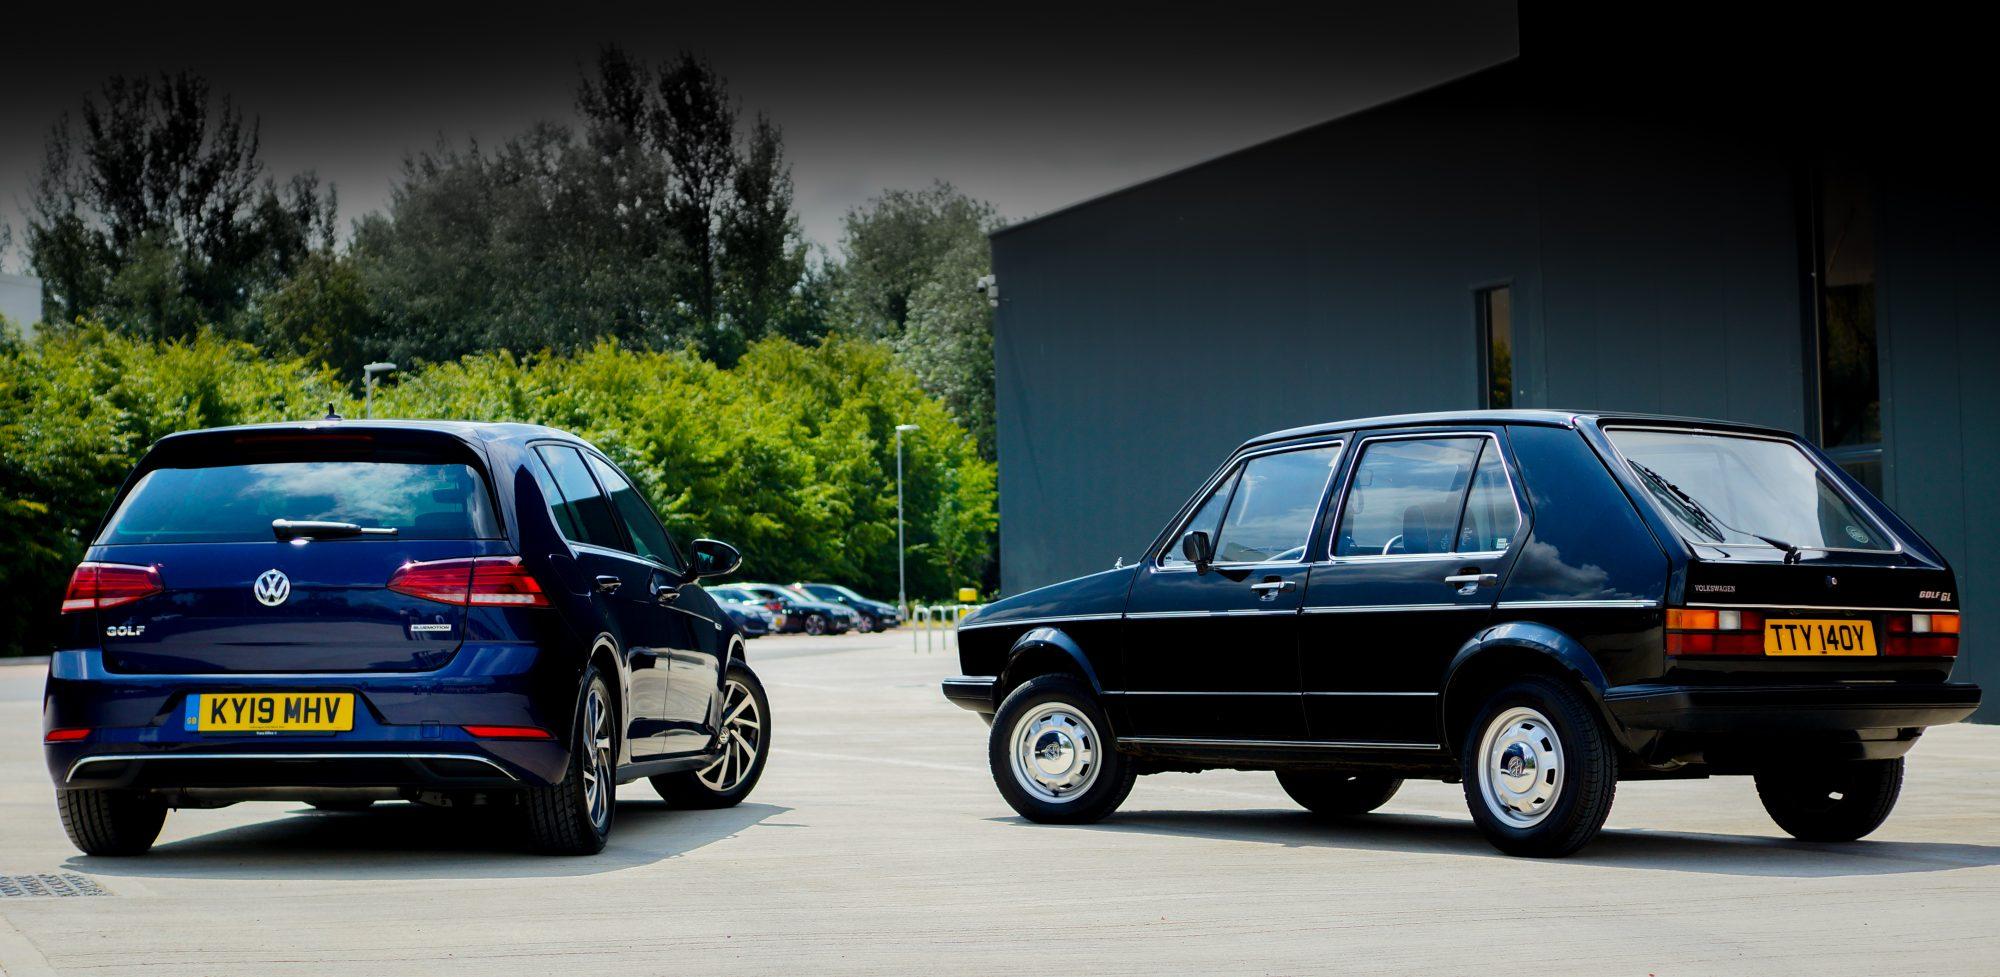 Golf, Volkswagen Golf, Volkswagen, Golf GTi, Golf GL